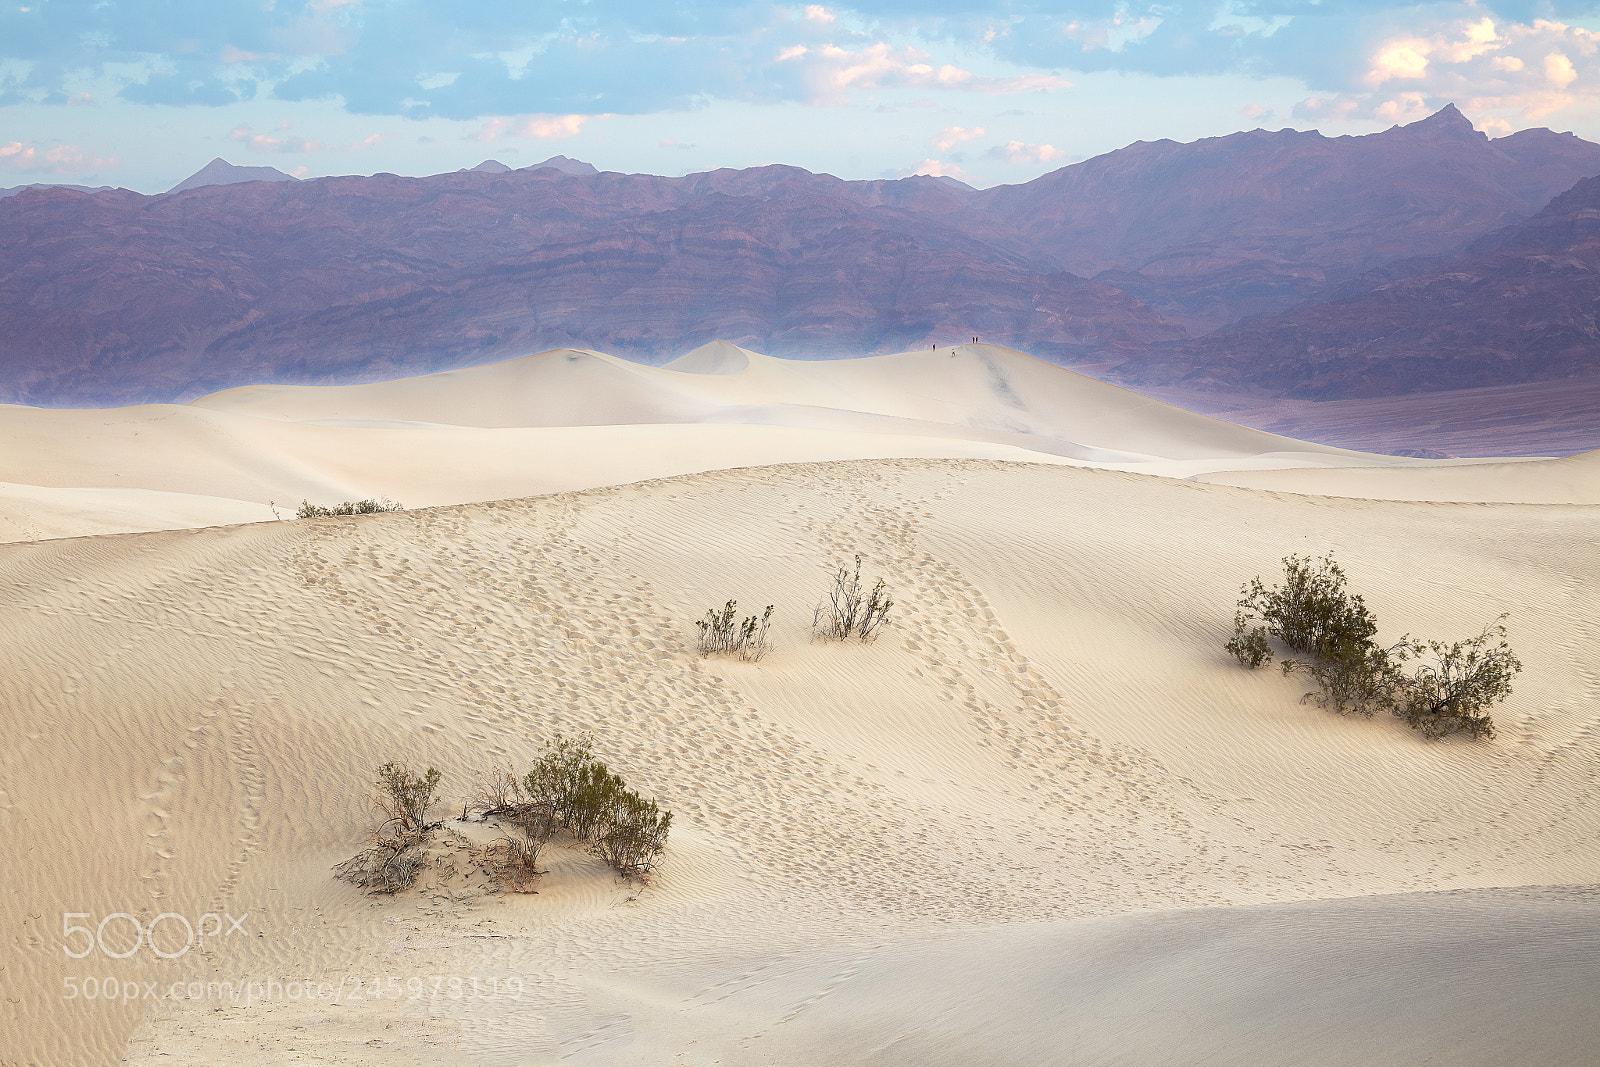 Mesquite Flat Sand Dunes, Canon EOS 5DS R, Canon EF 24-105mm f/4L IS USM